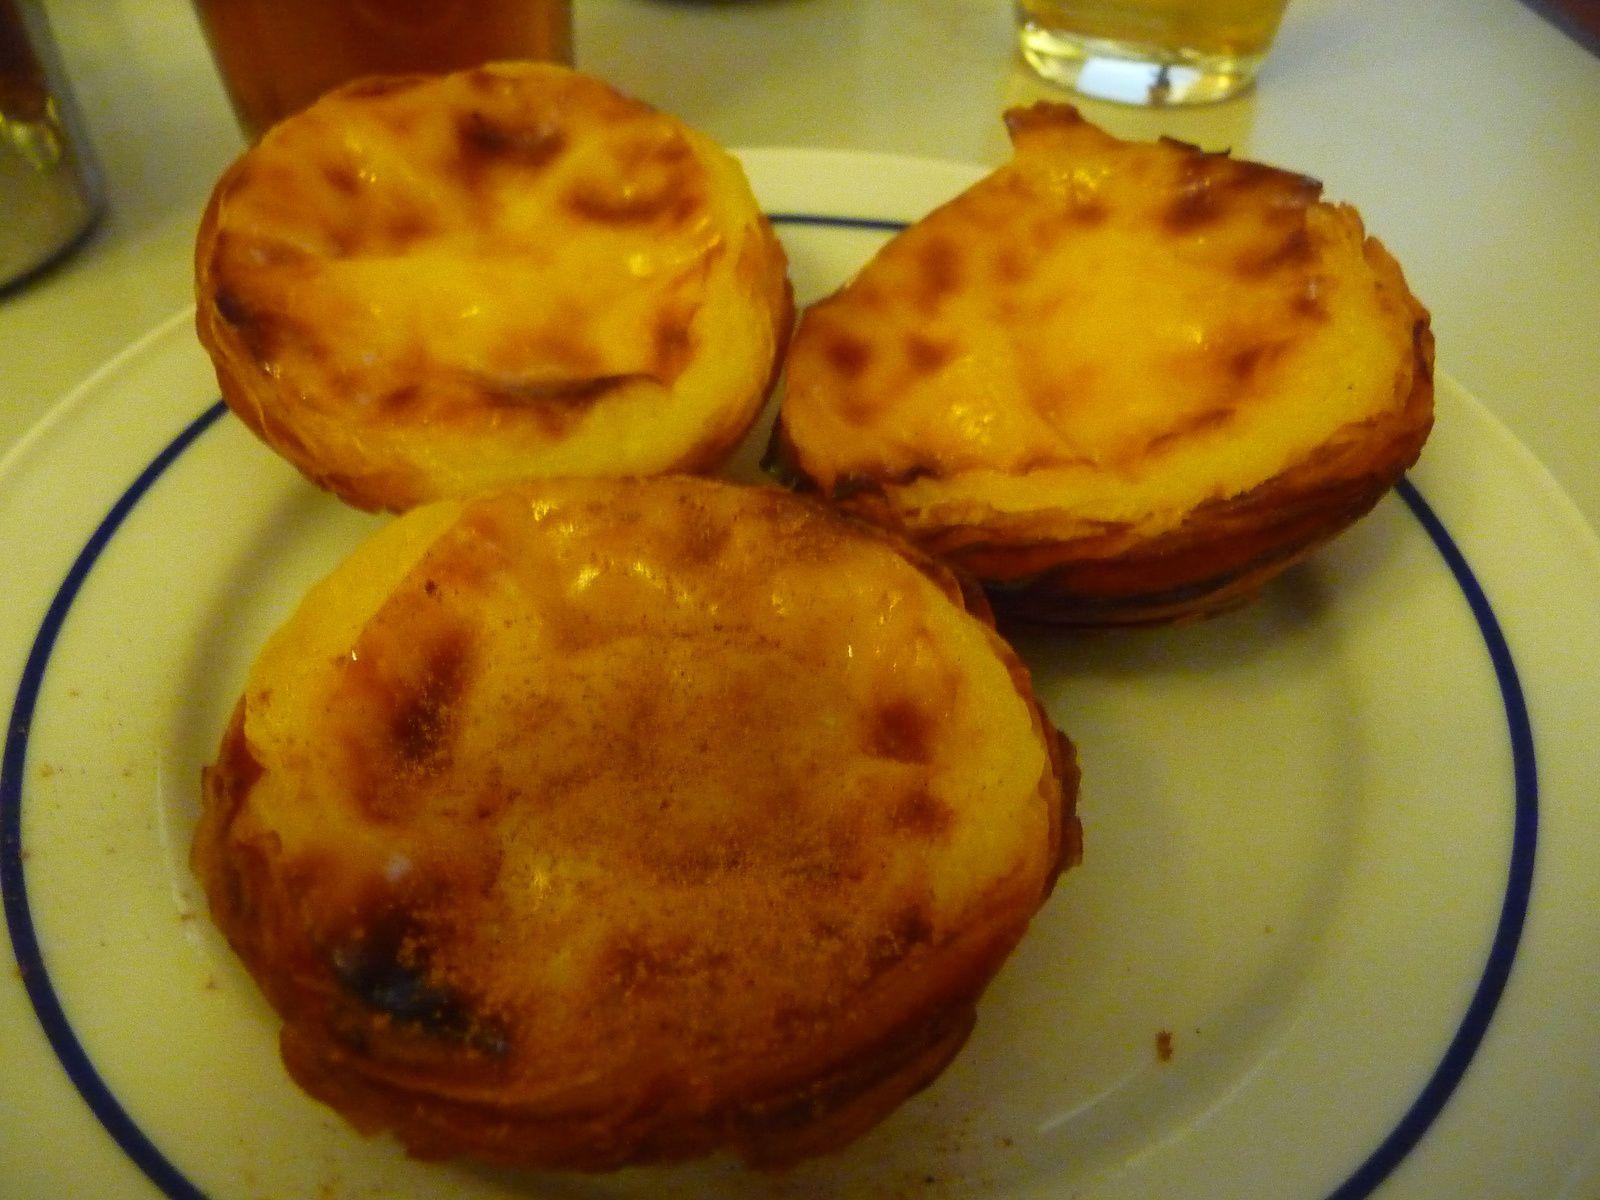 une pause gourmande  chez Antiga Confeitaria de Belem pour goûter les Pasteis  de nata